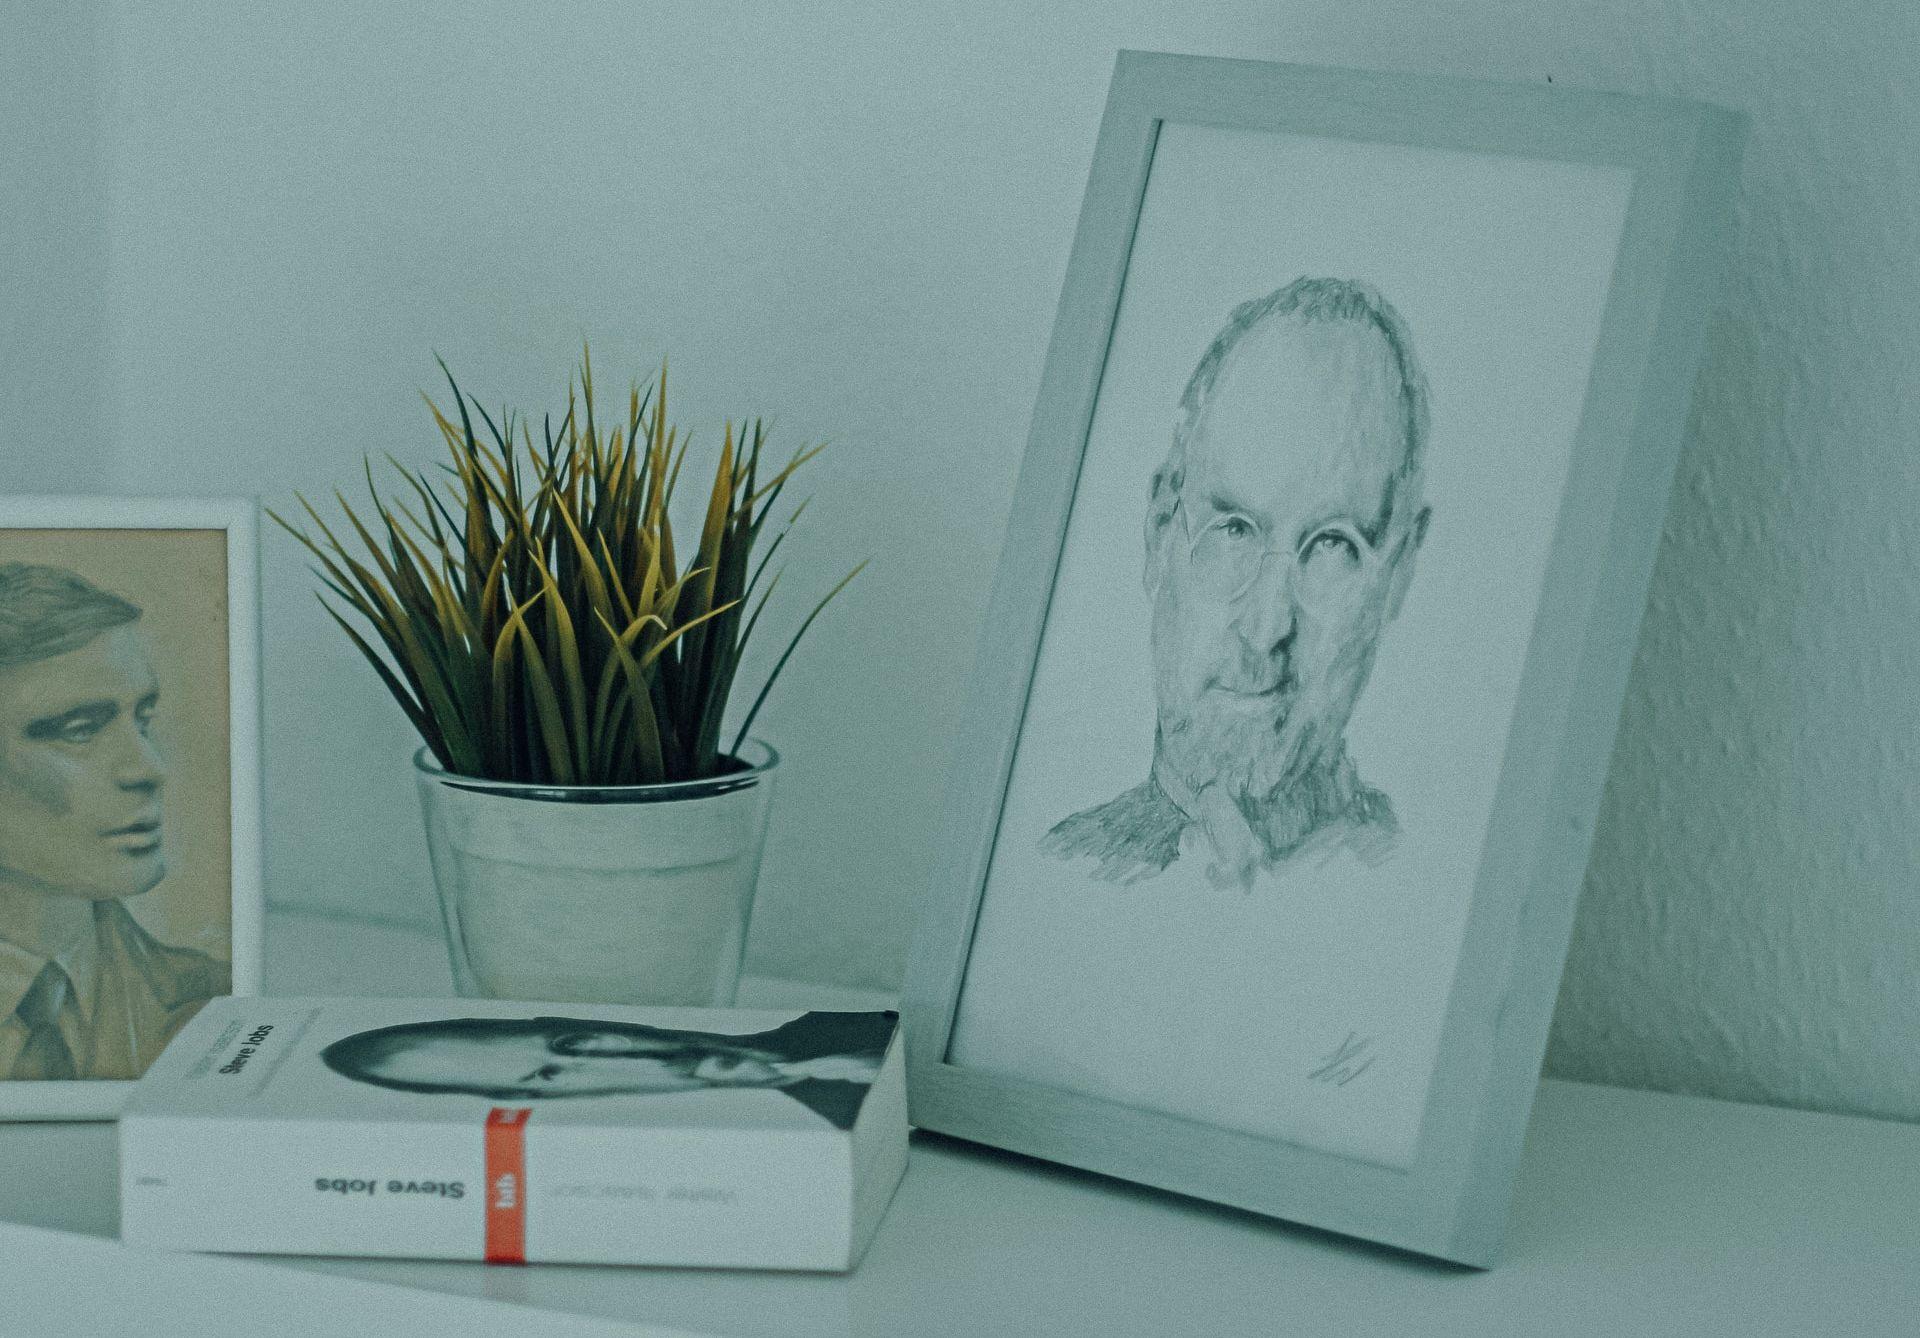 najlepsze biografie, Steve Jobs biografia